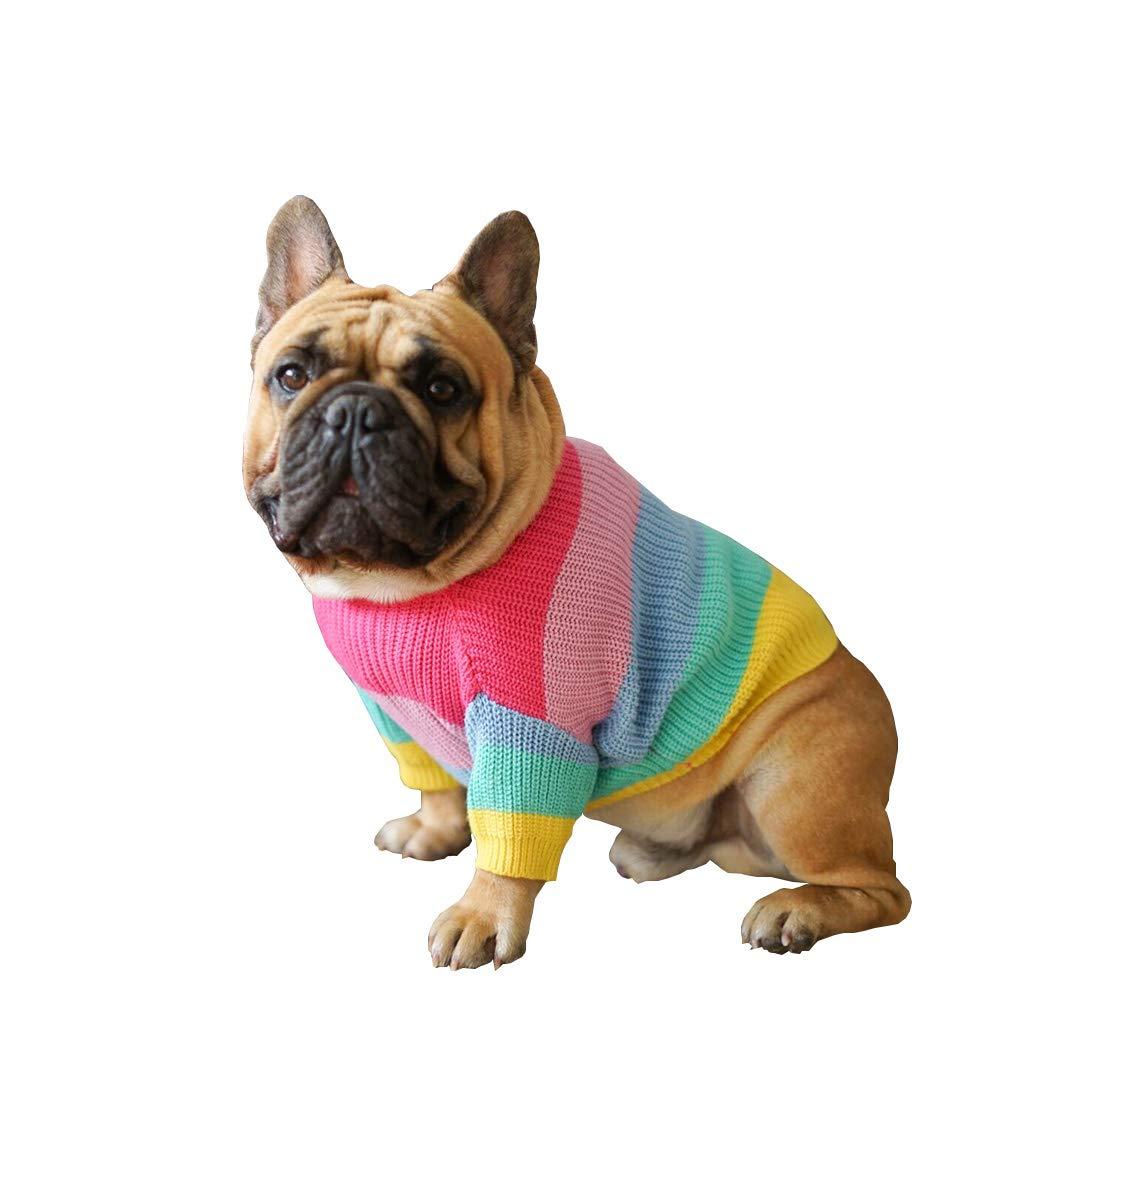 Khemn Bulldog Rainbow Knitted Sweater, Dog Pullover, Cute Dog Clothes for French Bulldog/English Bulldog/Bull Terrier/Pug (XL)